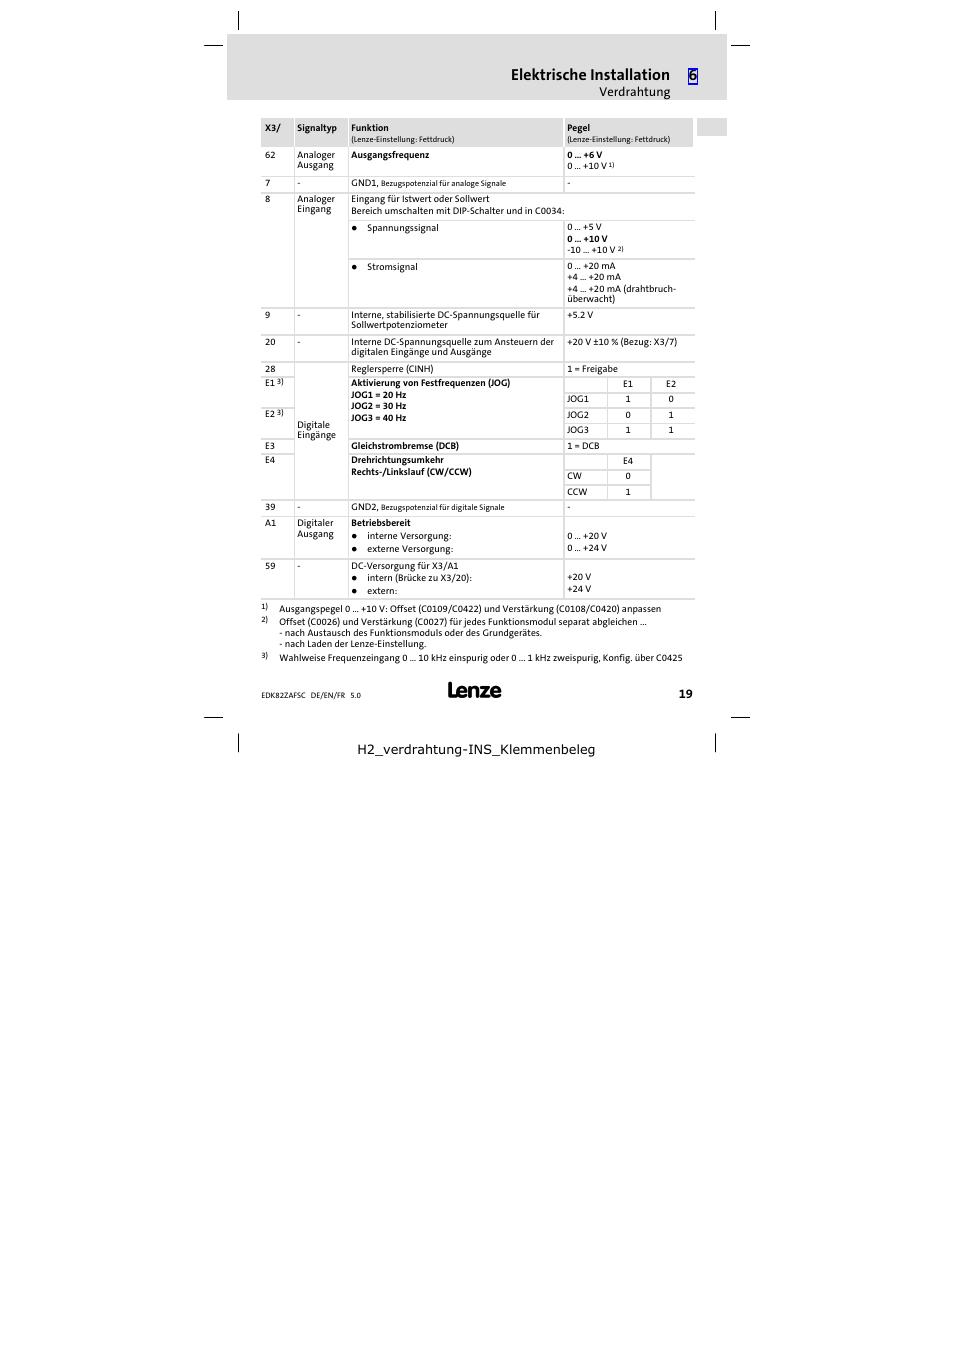 Elektrische installation | Lenze E82ZAFSC001 User Manual | Page 19 ...